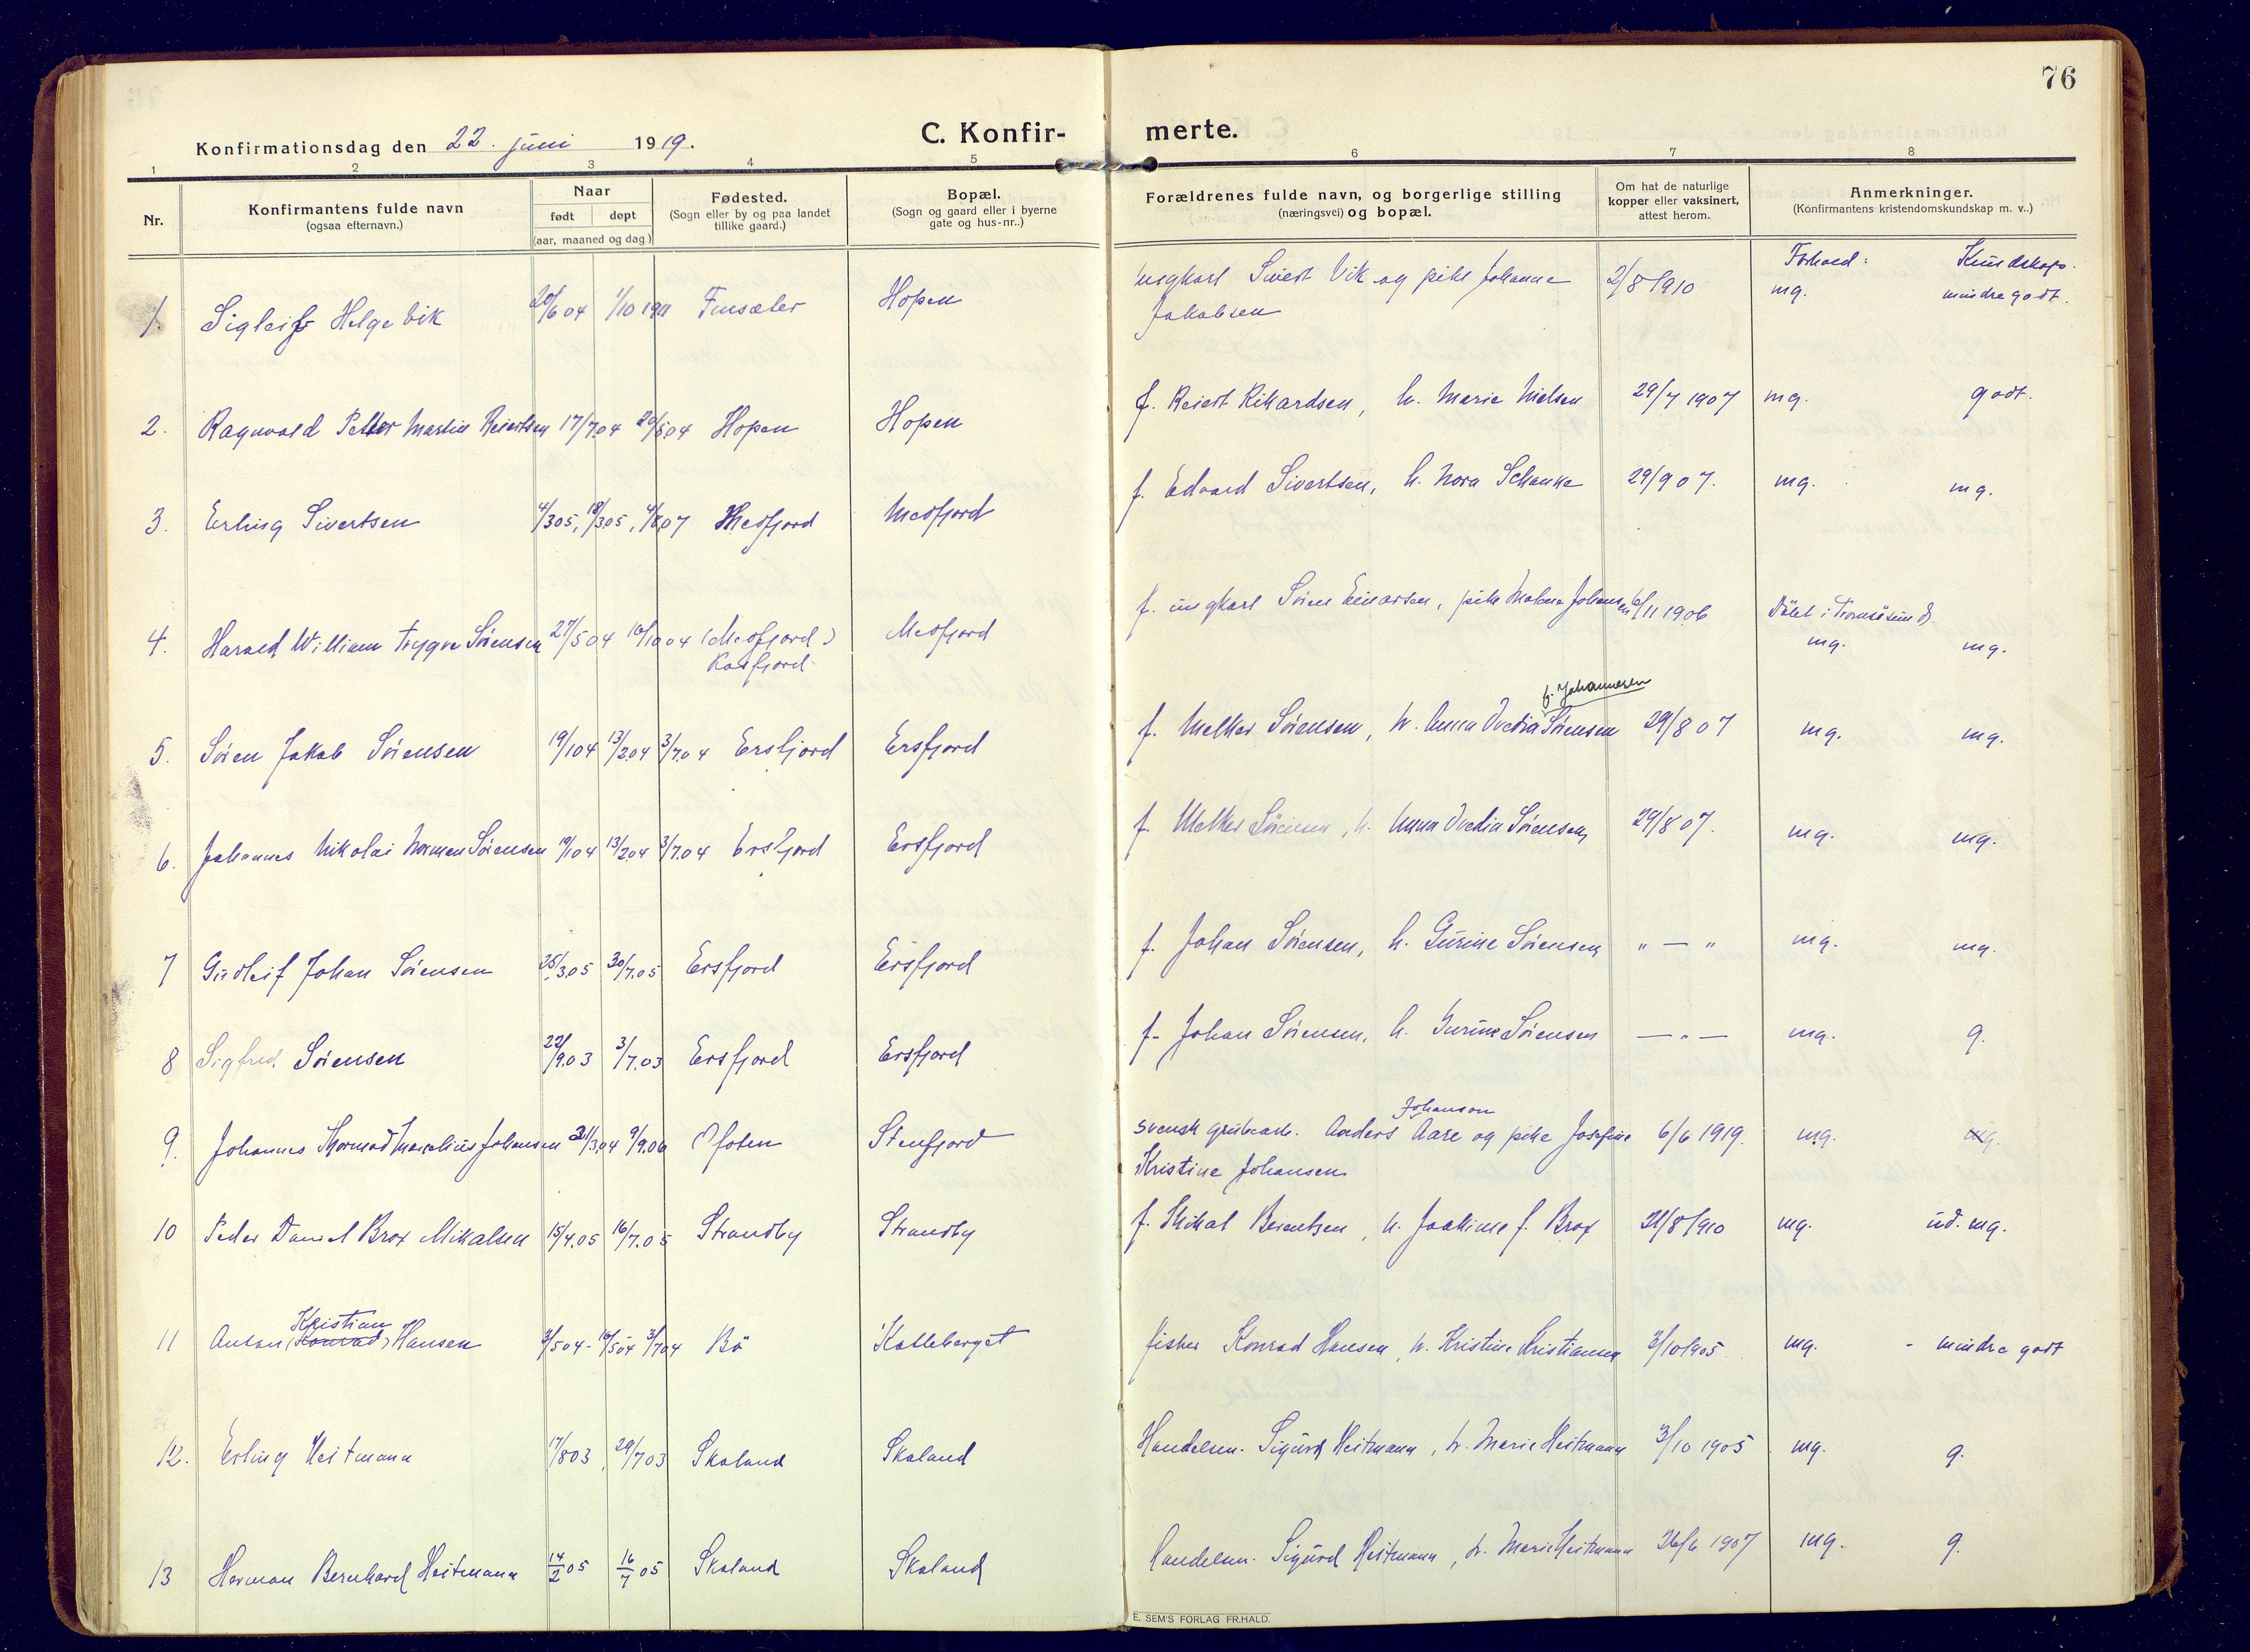 SATØ, Mefjord/Berg sokneprestkontor, G/Ga/Gaa: Ministerialbok nr. 9, 1916-1928, s. 76